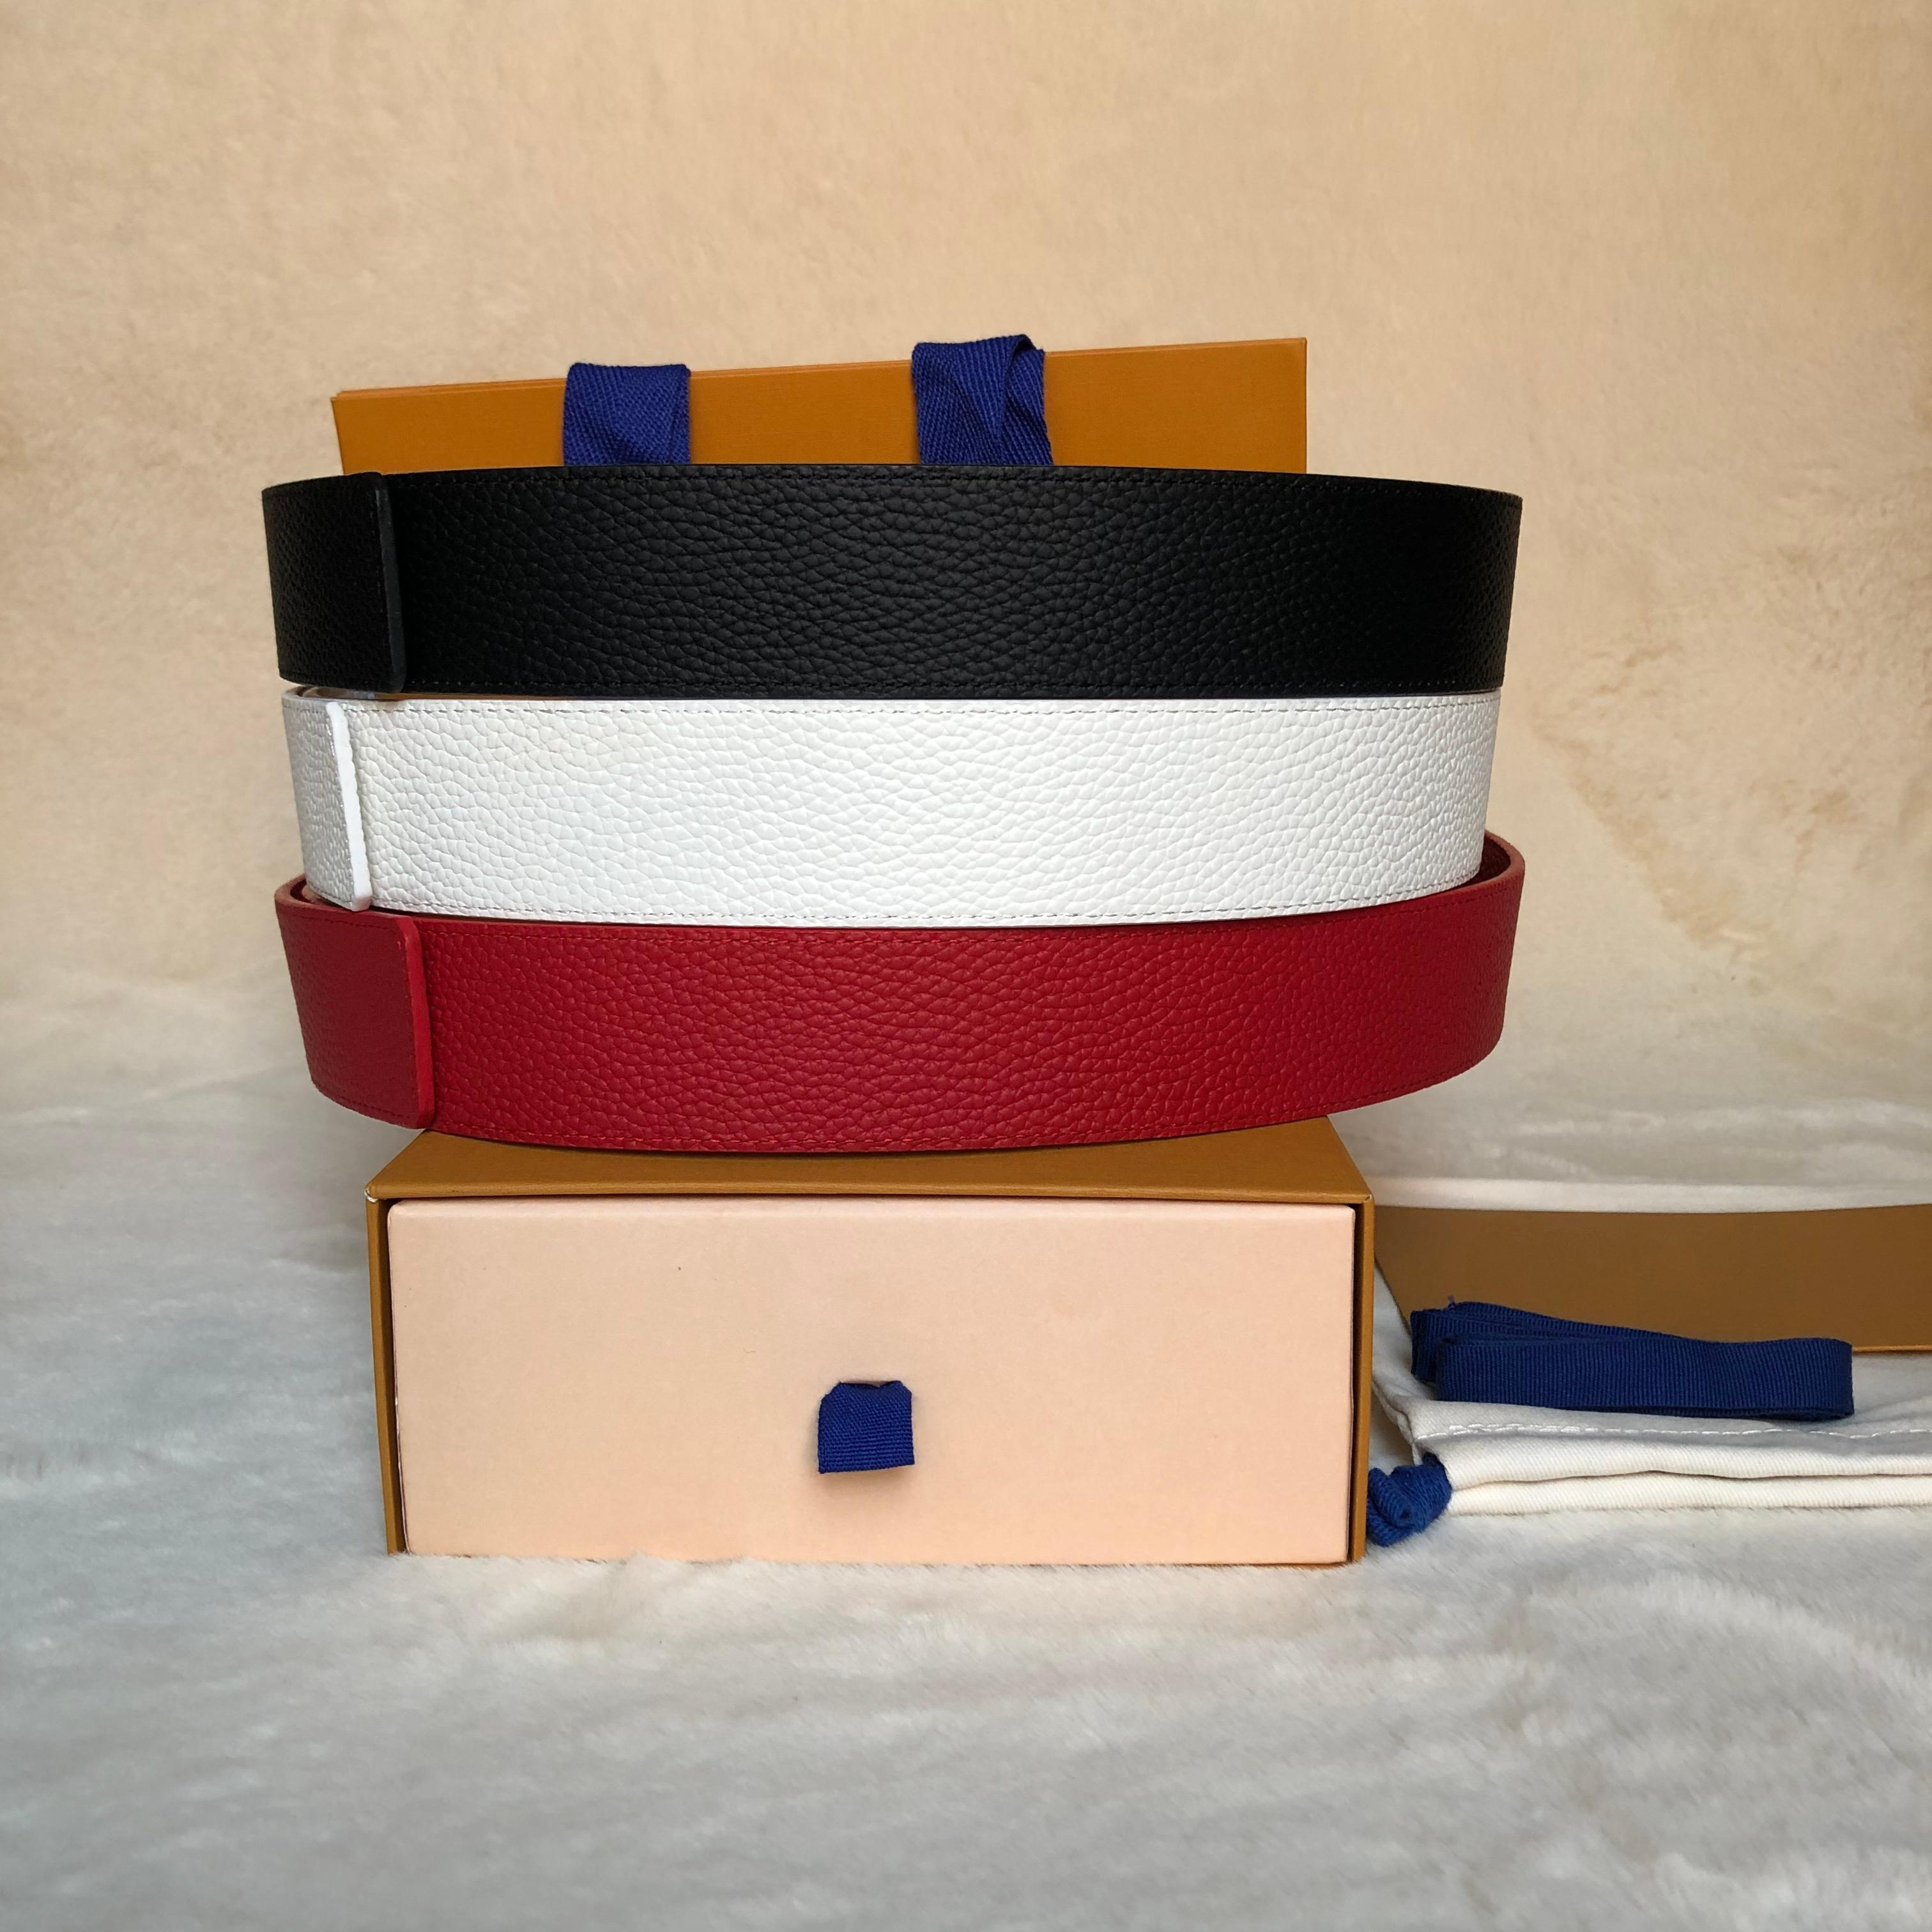 Cintura da uomo in vera pelle rossa bianca bianca bianca con scatola con scatola classica Brown Lettera Black Brown Brown Brown Grid Belt spedizione gratuita 06